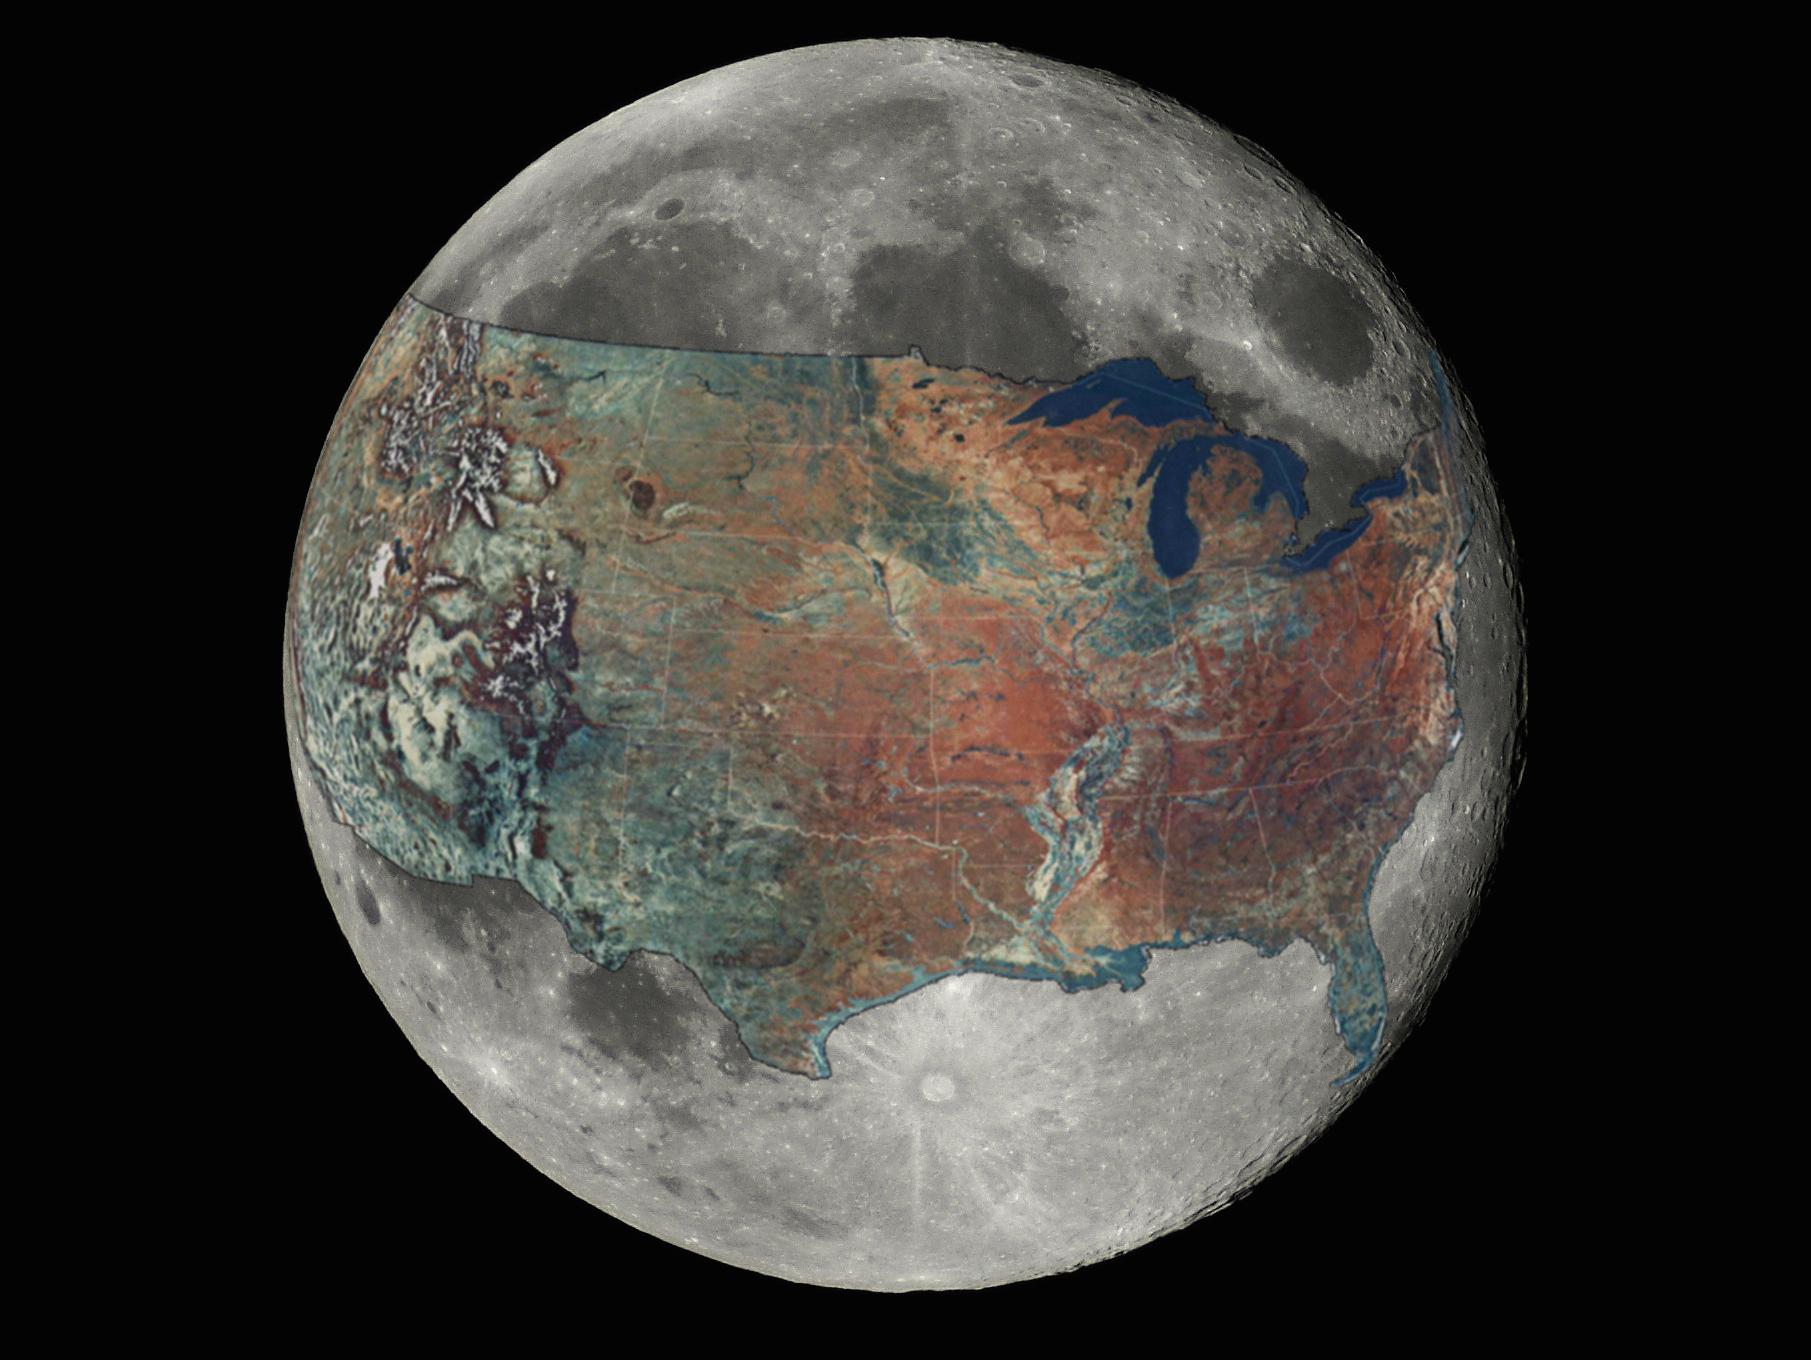 mars moon same size as - photo #21